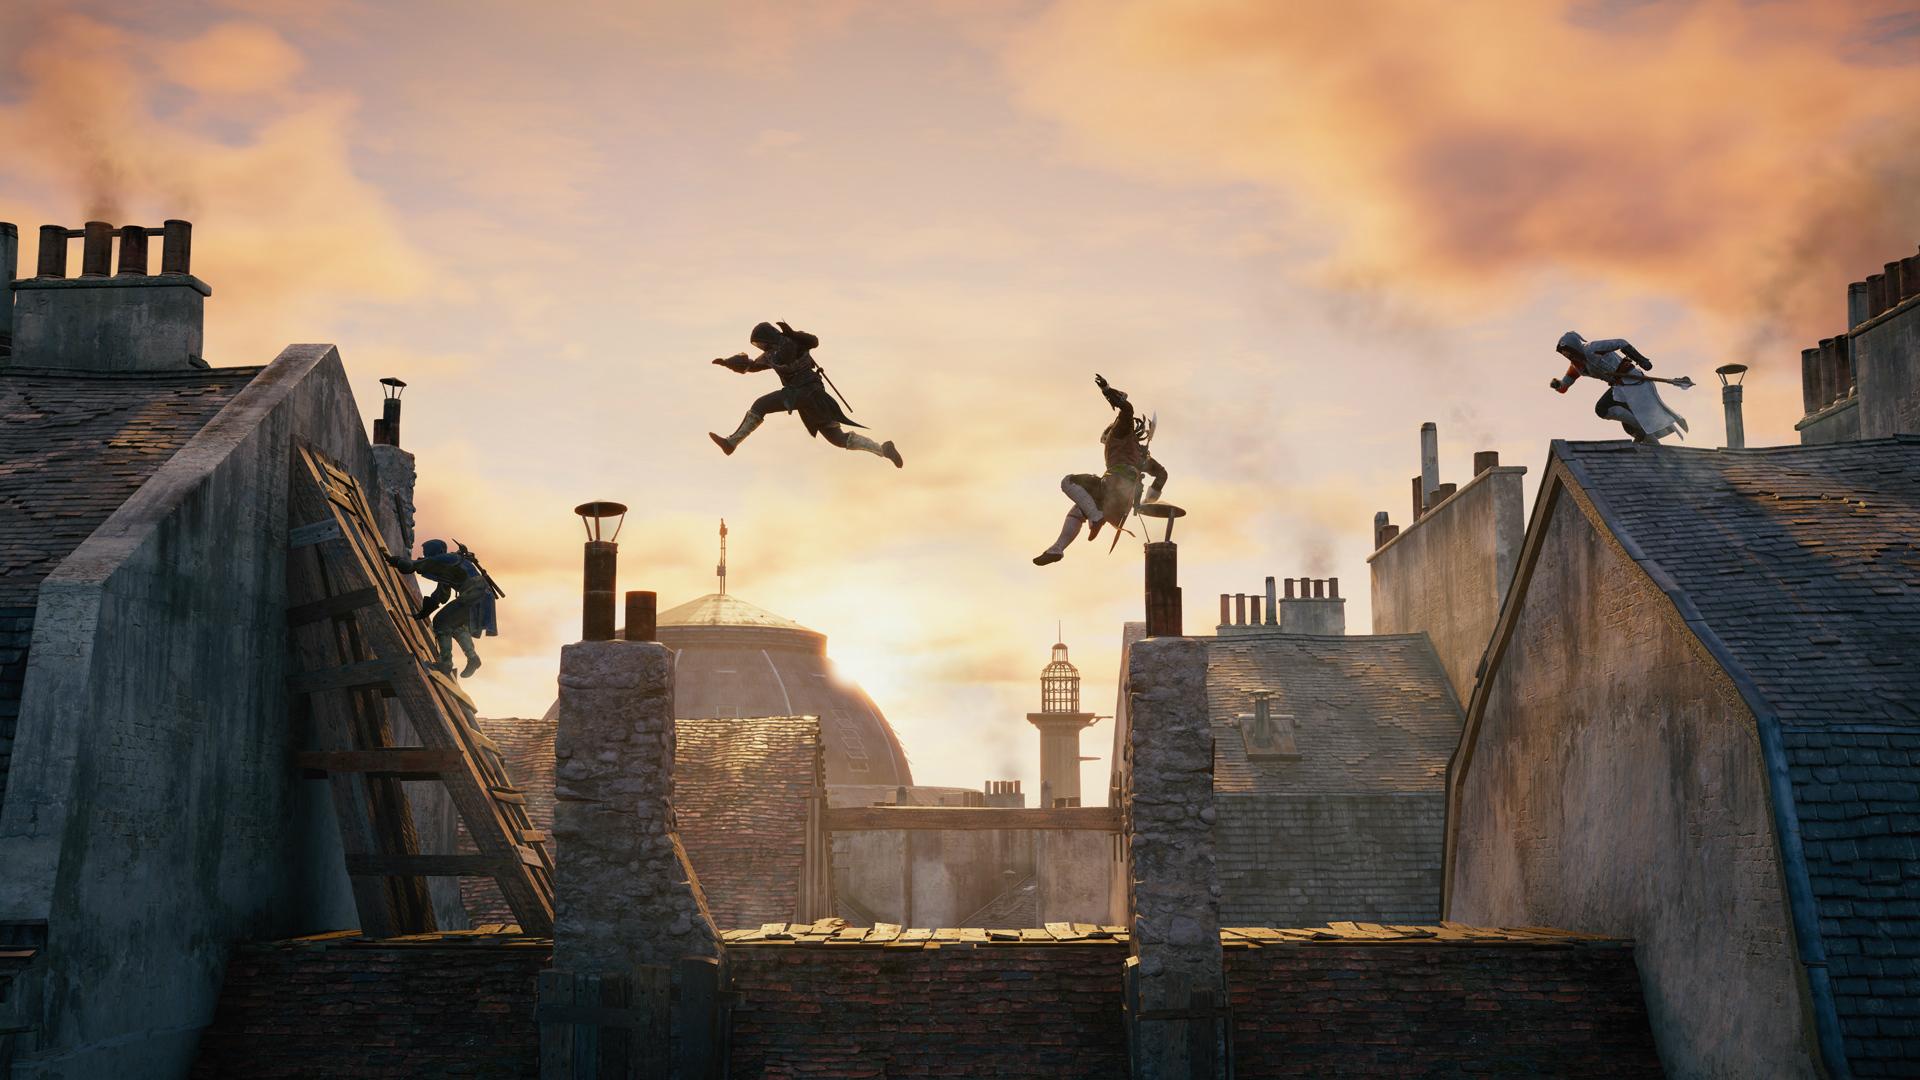 Assassin's Creed: Unity